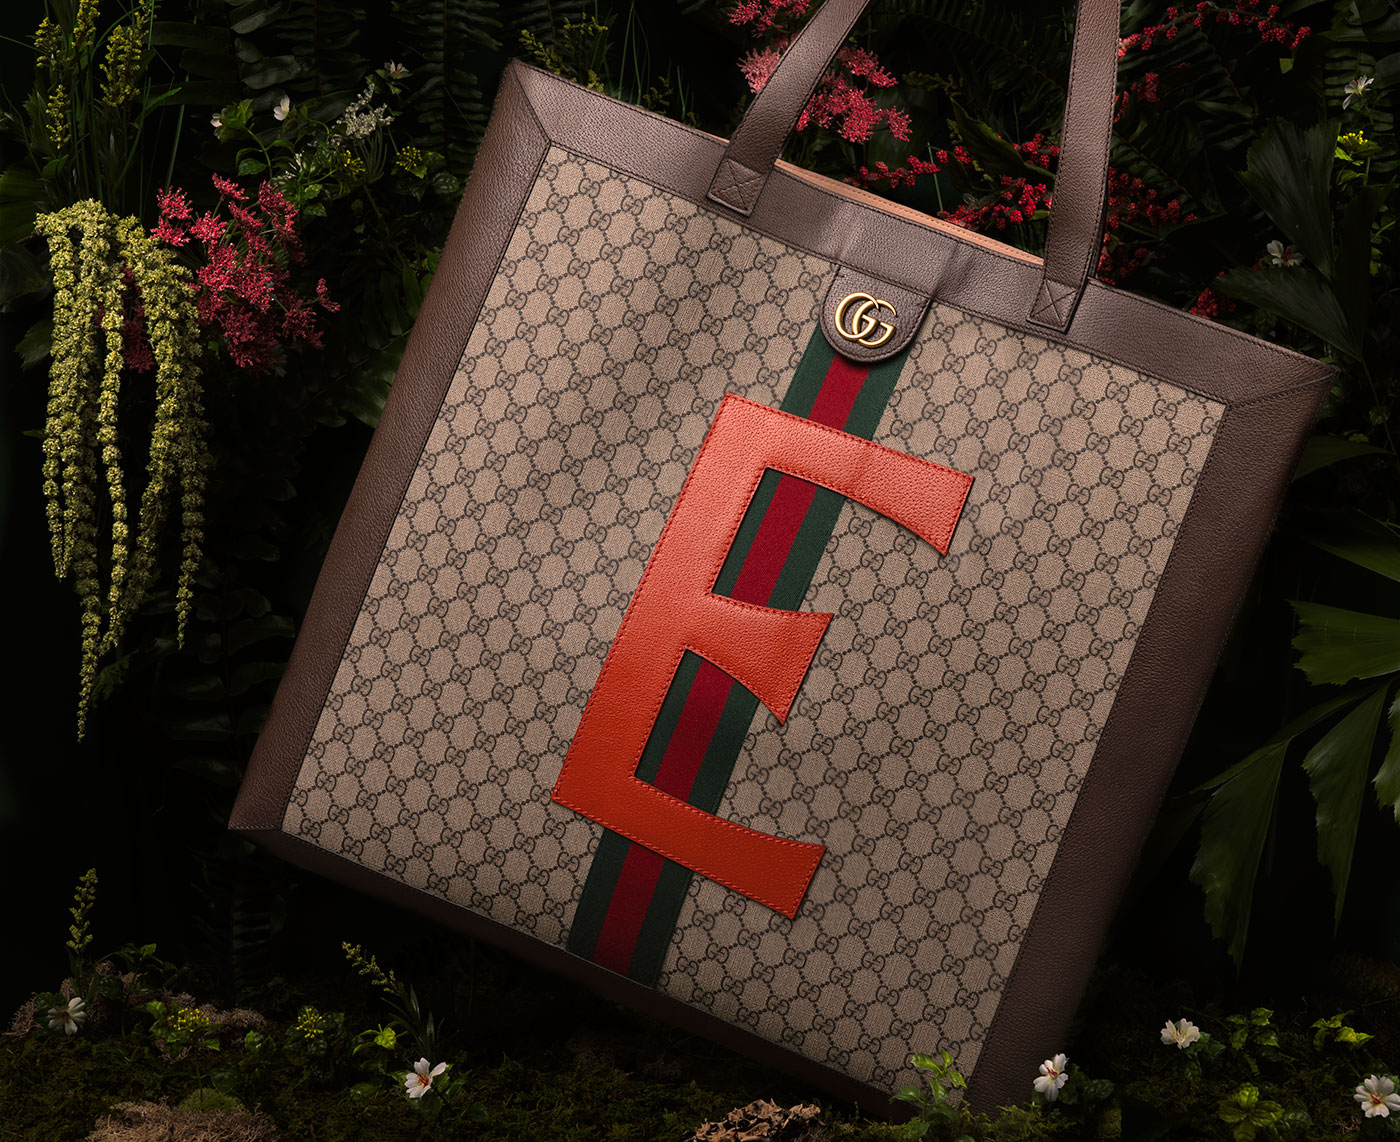 3db4fd306418 Introducing Gucci DIY: You Can Now Customize A Gucci Bag - PurseBlog